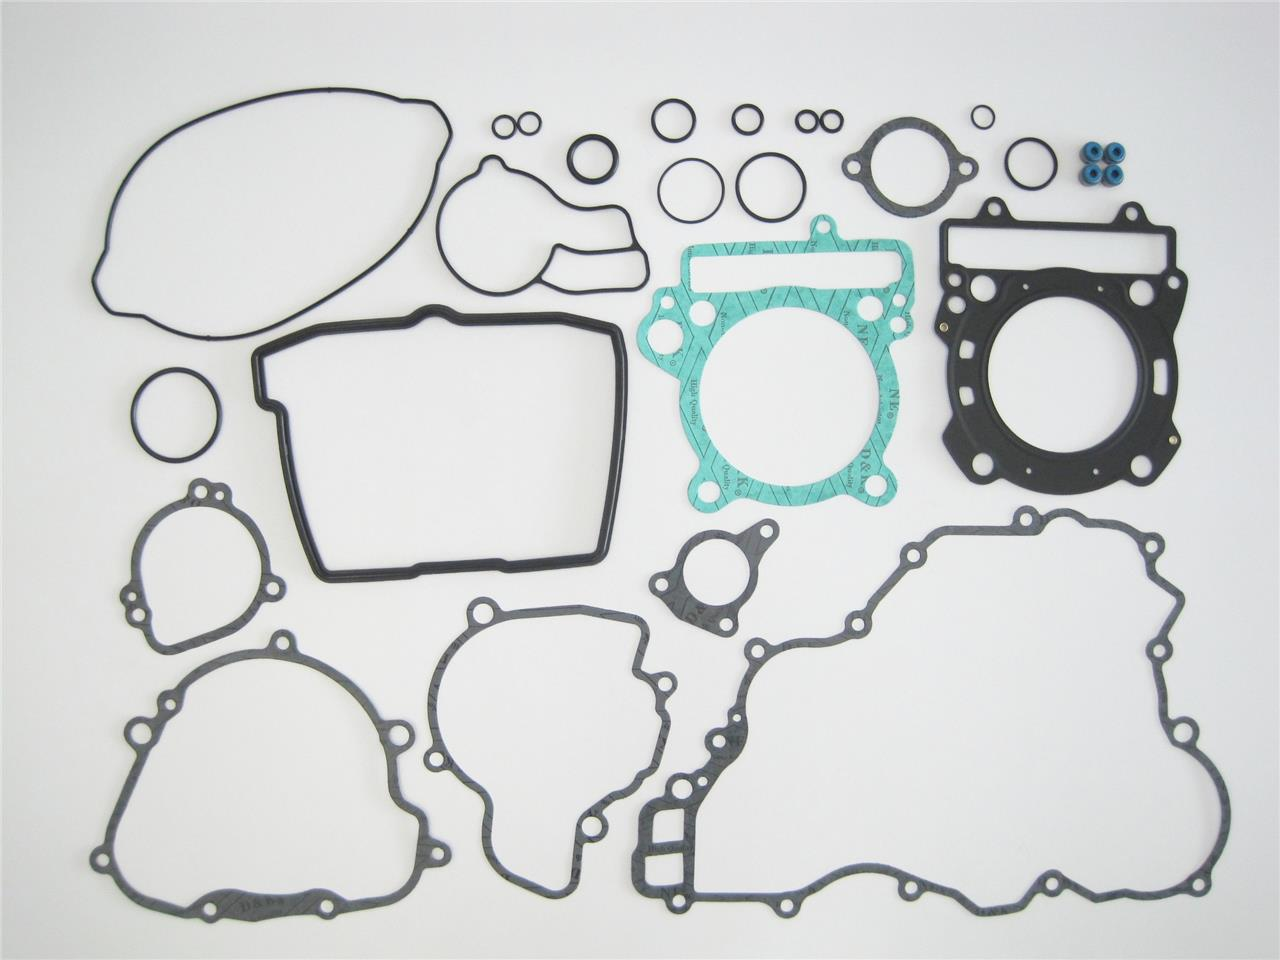 TECNIUM テクニウムTECHNIUM コンプリートエンジンガスケットセット KTM用(Tecnium Complete Engine Gasket Set KTM【ヨーロッパ直輸入品】)